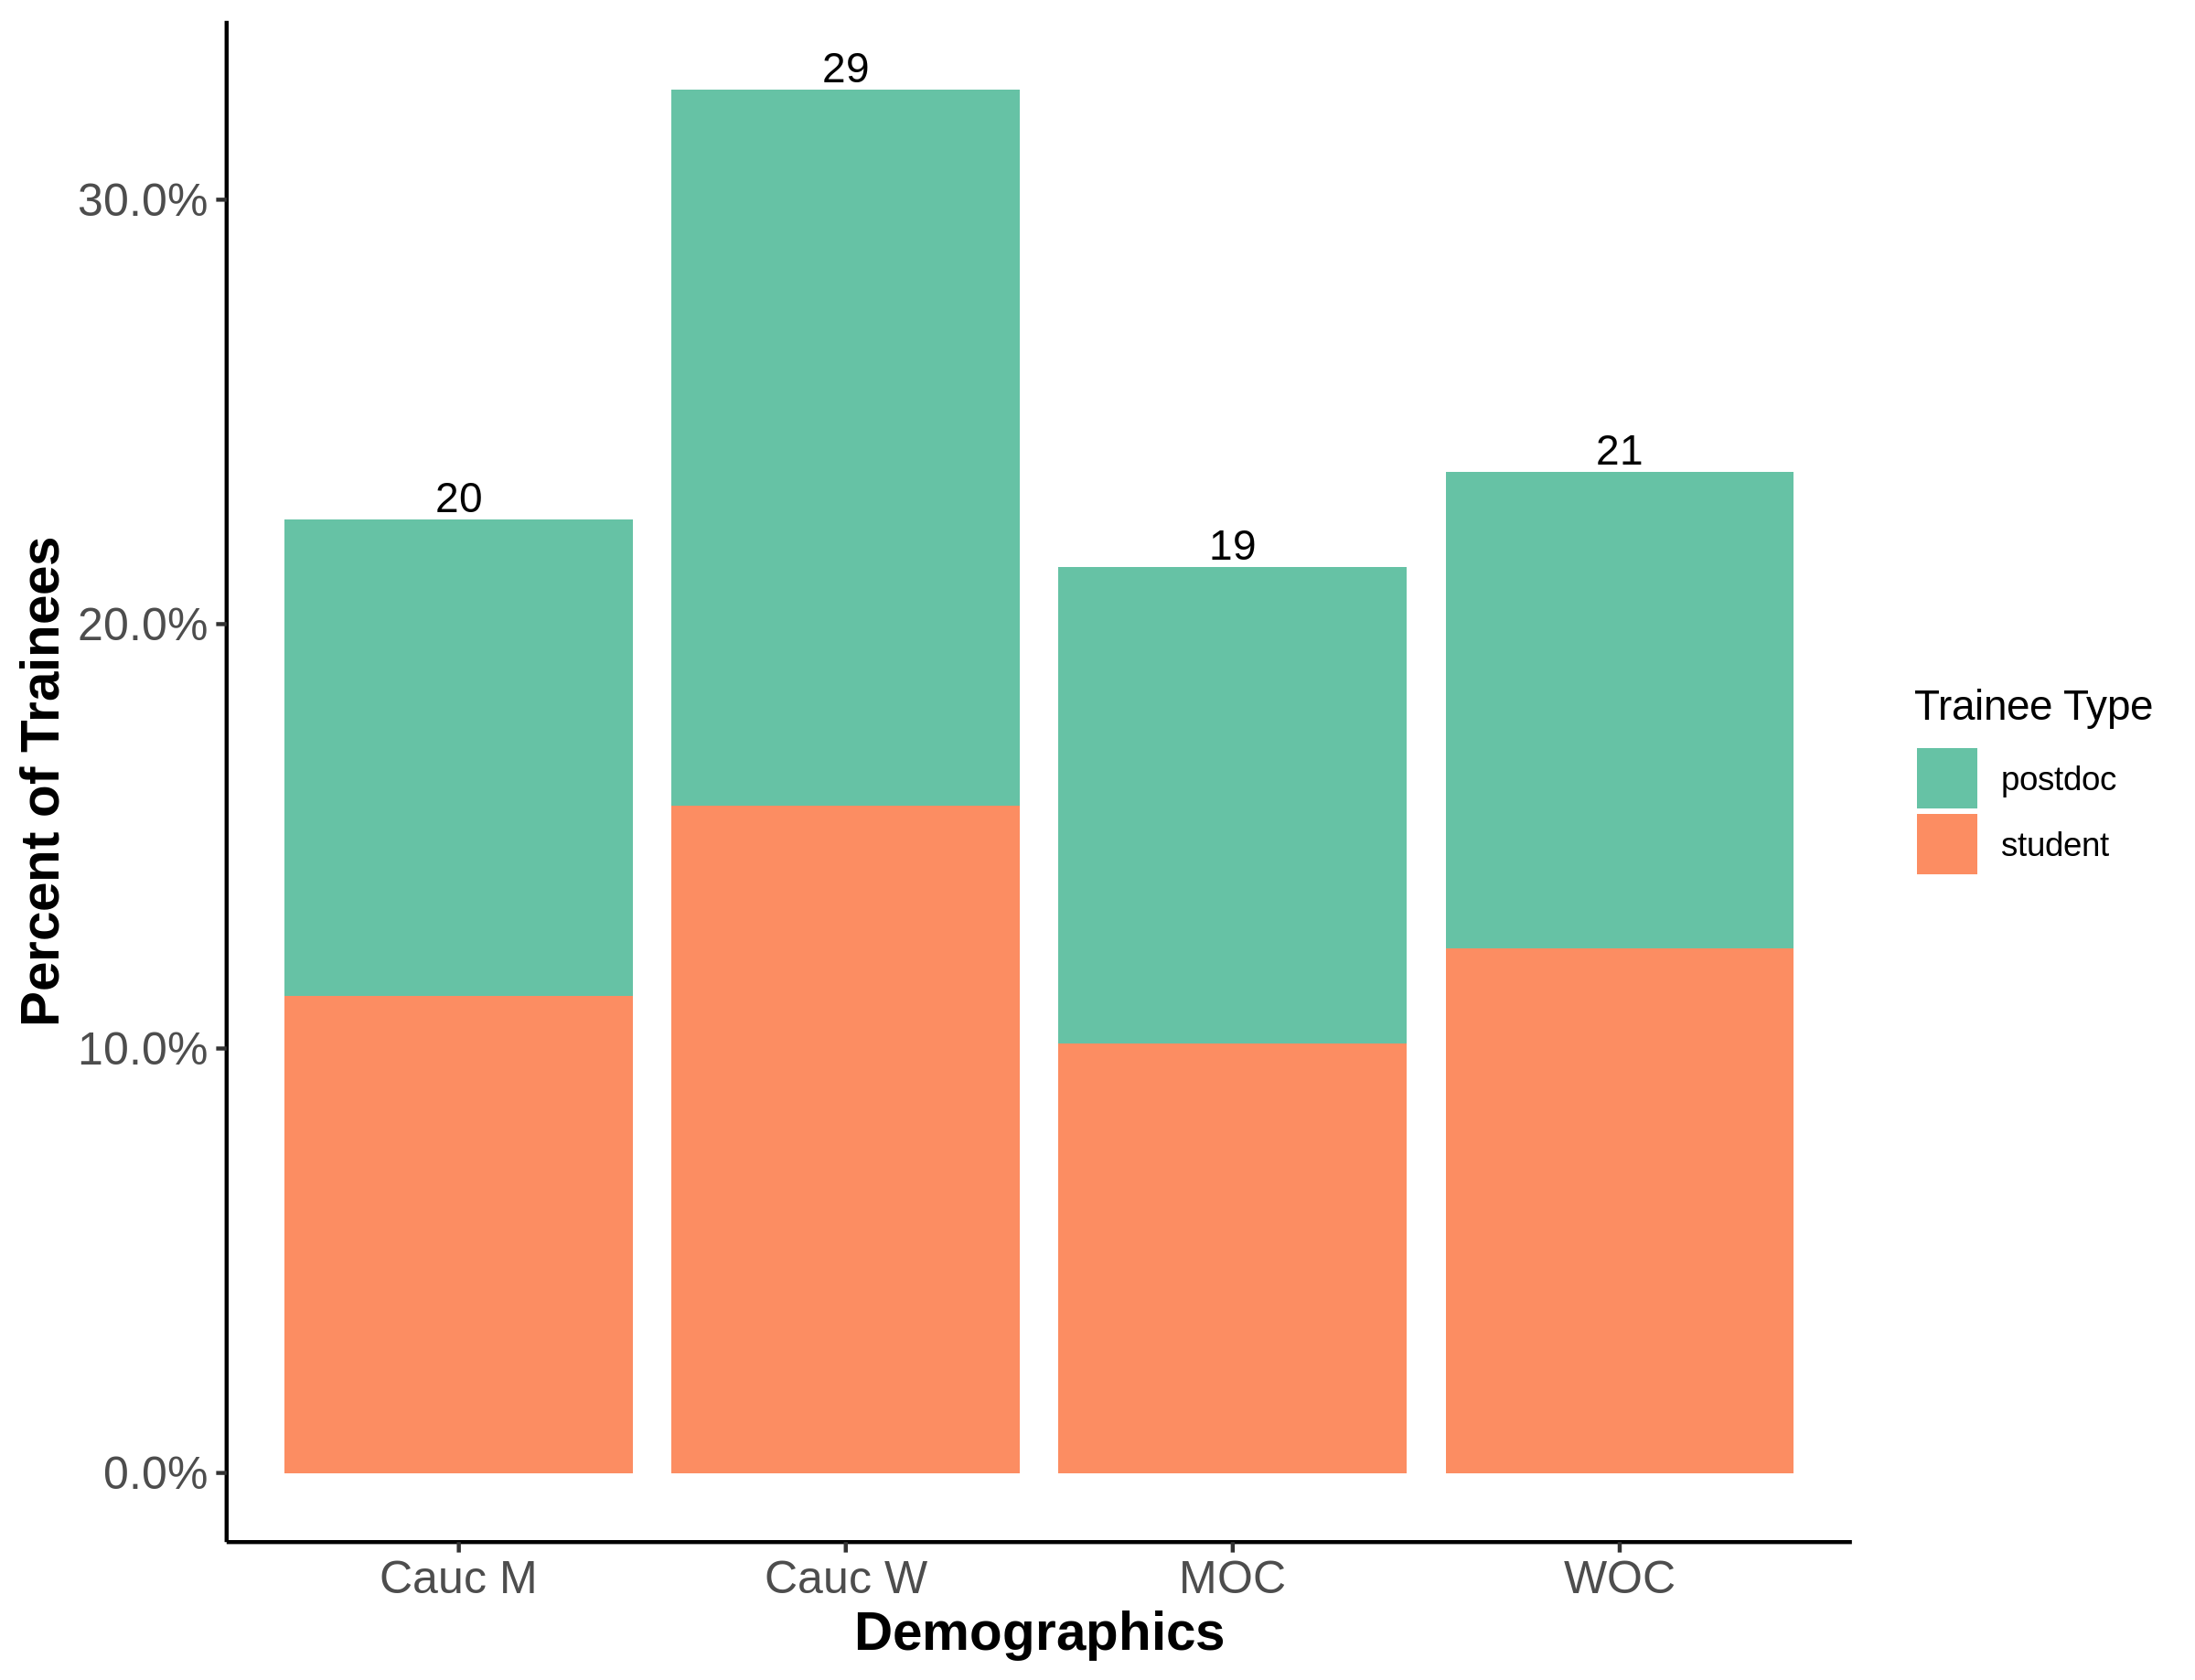 Trainee Demographics